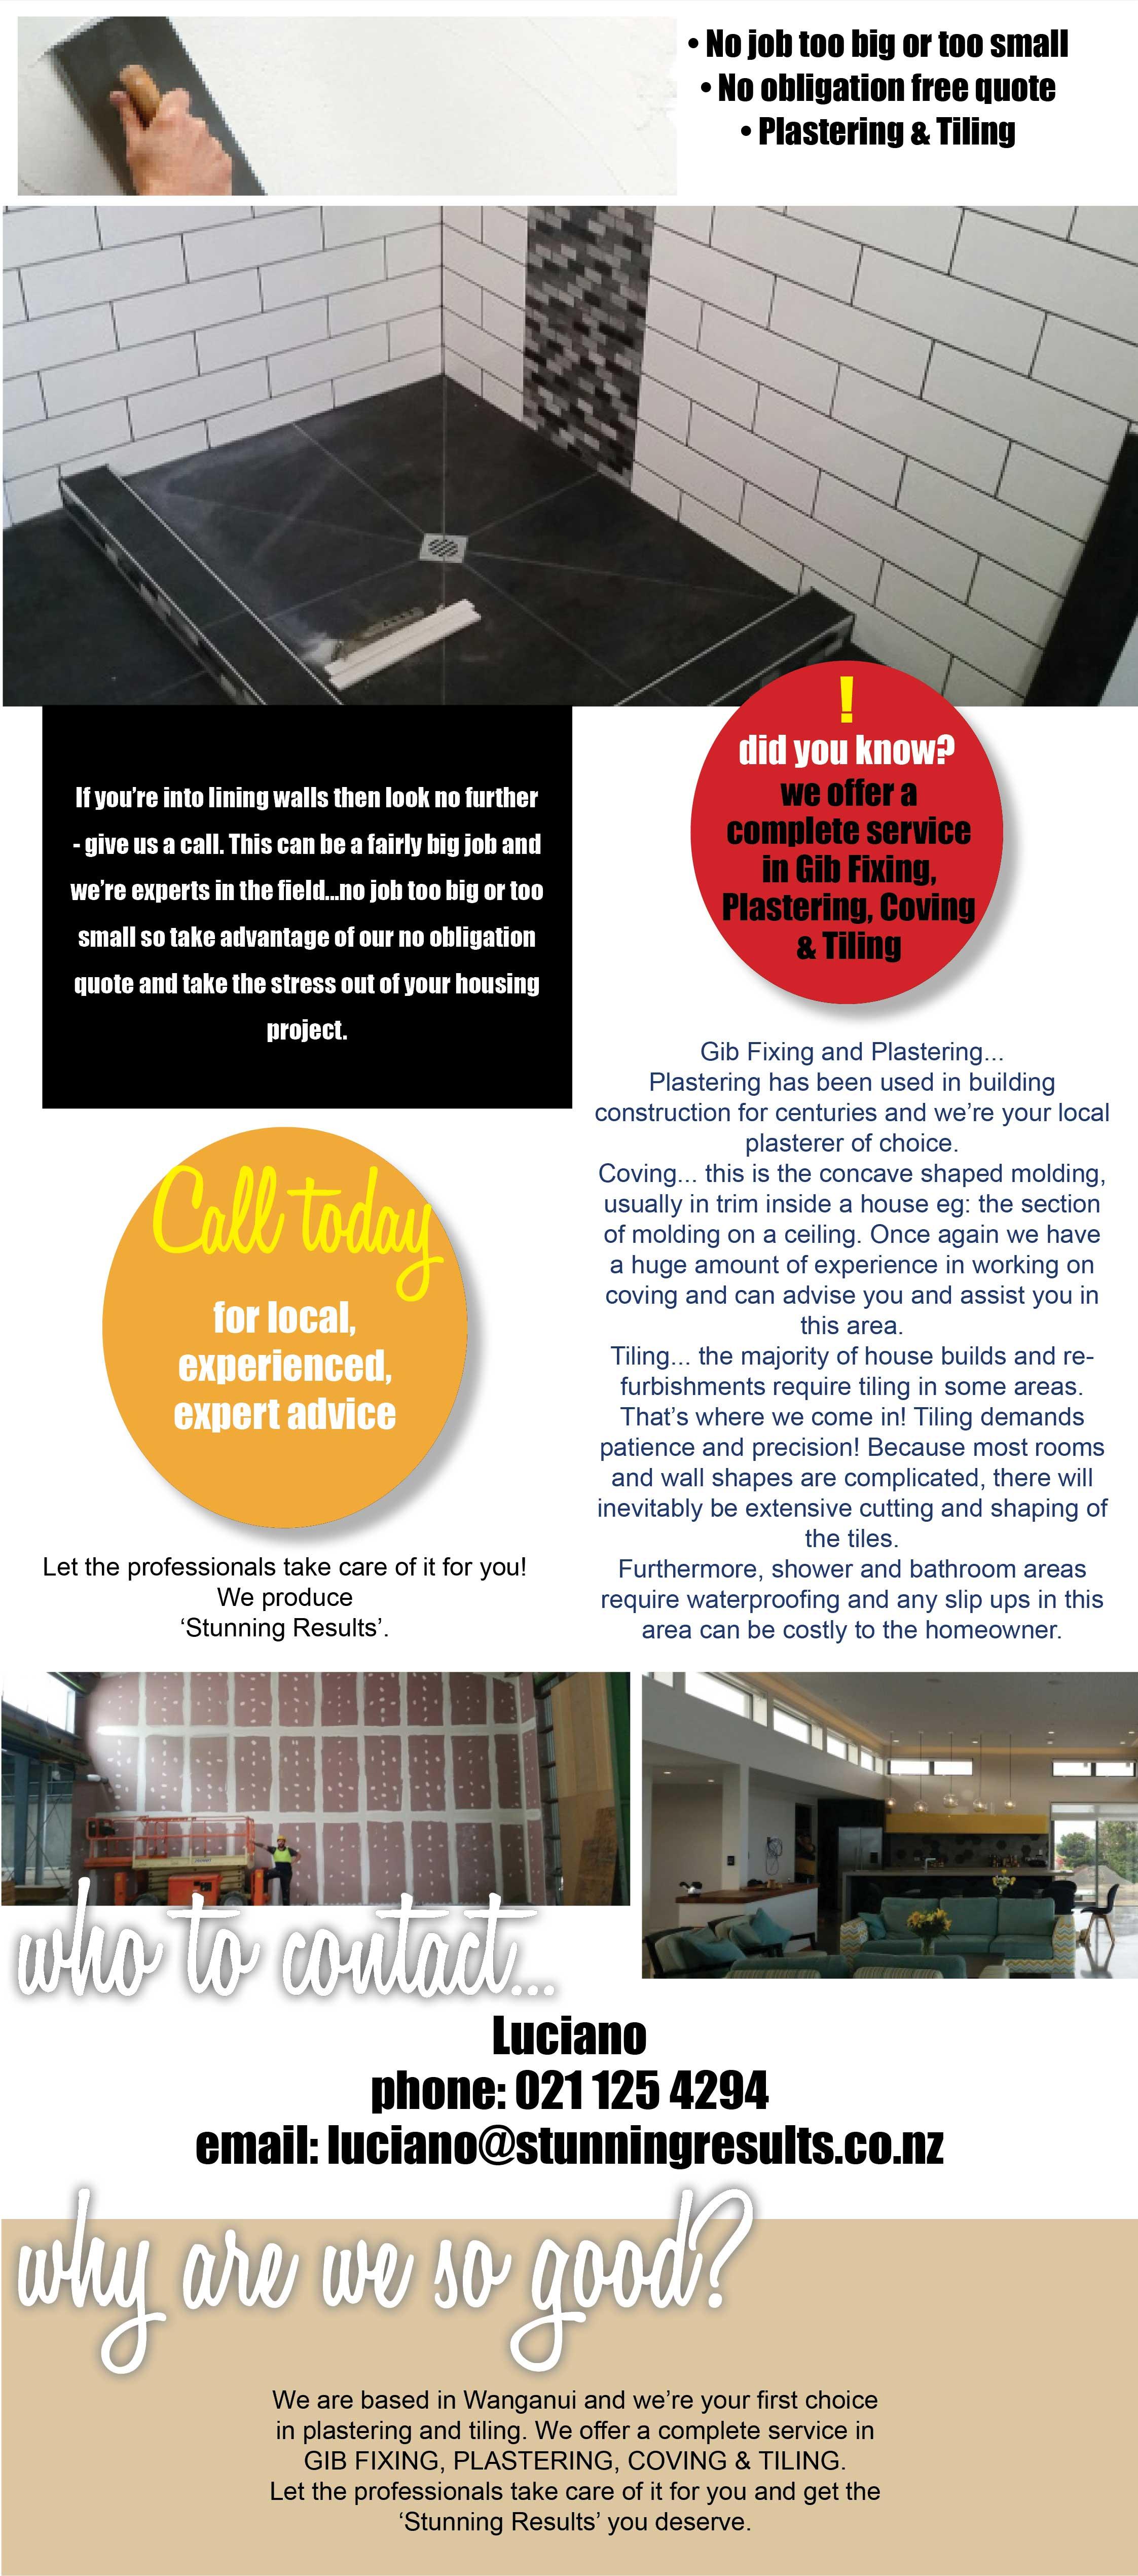 Plastering, Gib Fixing, Coving, Tiling. Free quotes. Wanganui Plasterers. Plasterers Wanganui